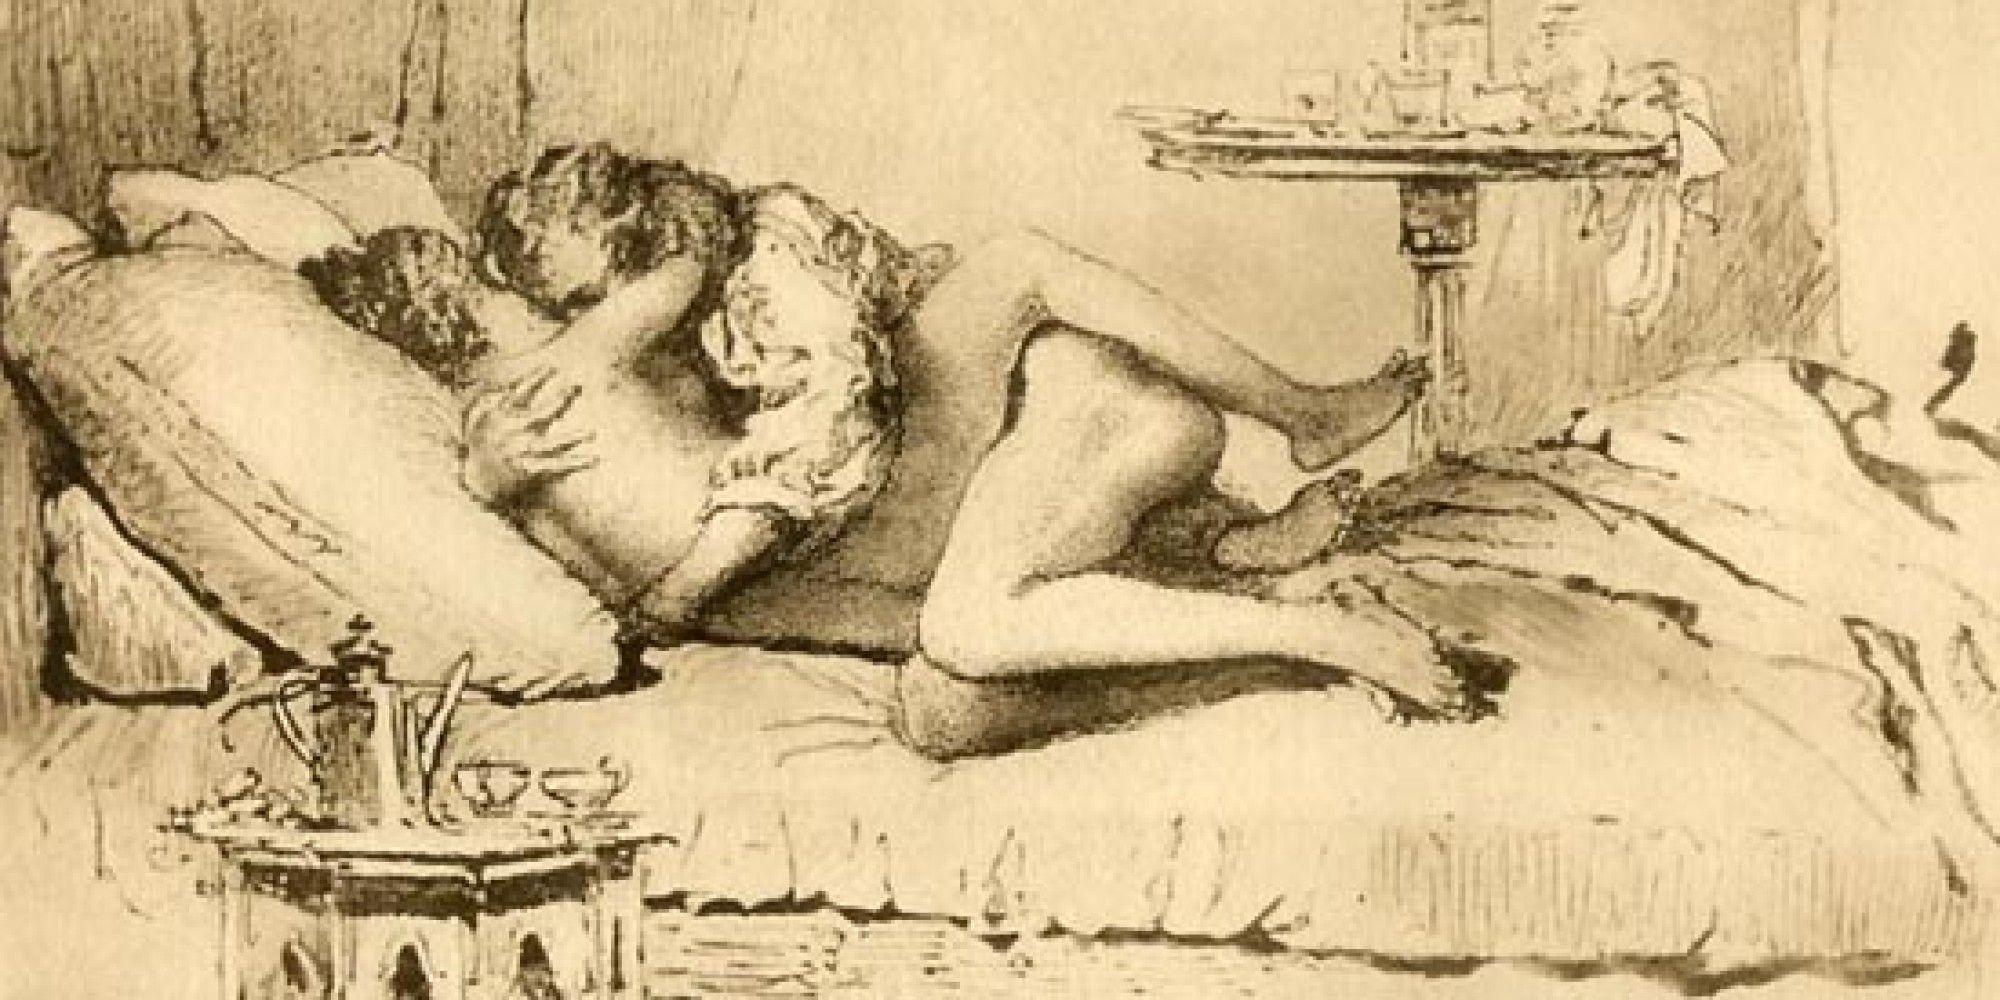 from Layton 19th century erotic art gay